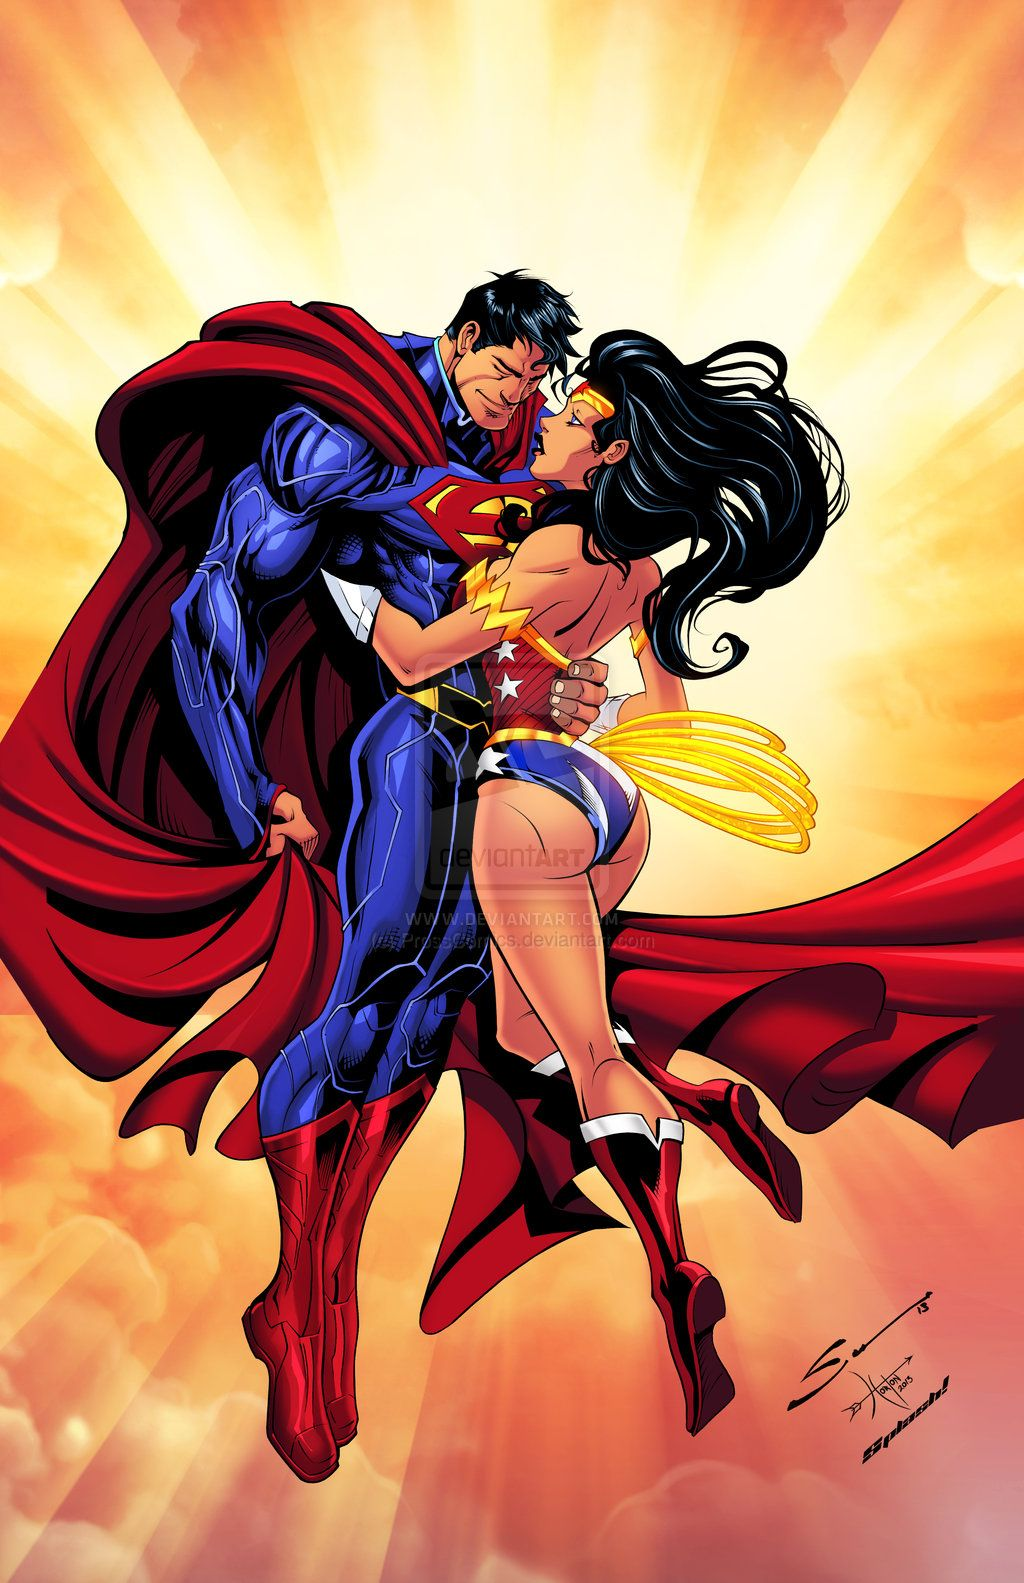 Superman  Wonder Women  DC COMICS  Pinterest  Superman wonder